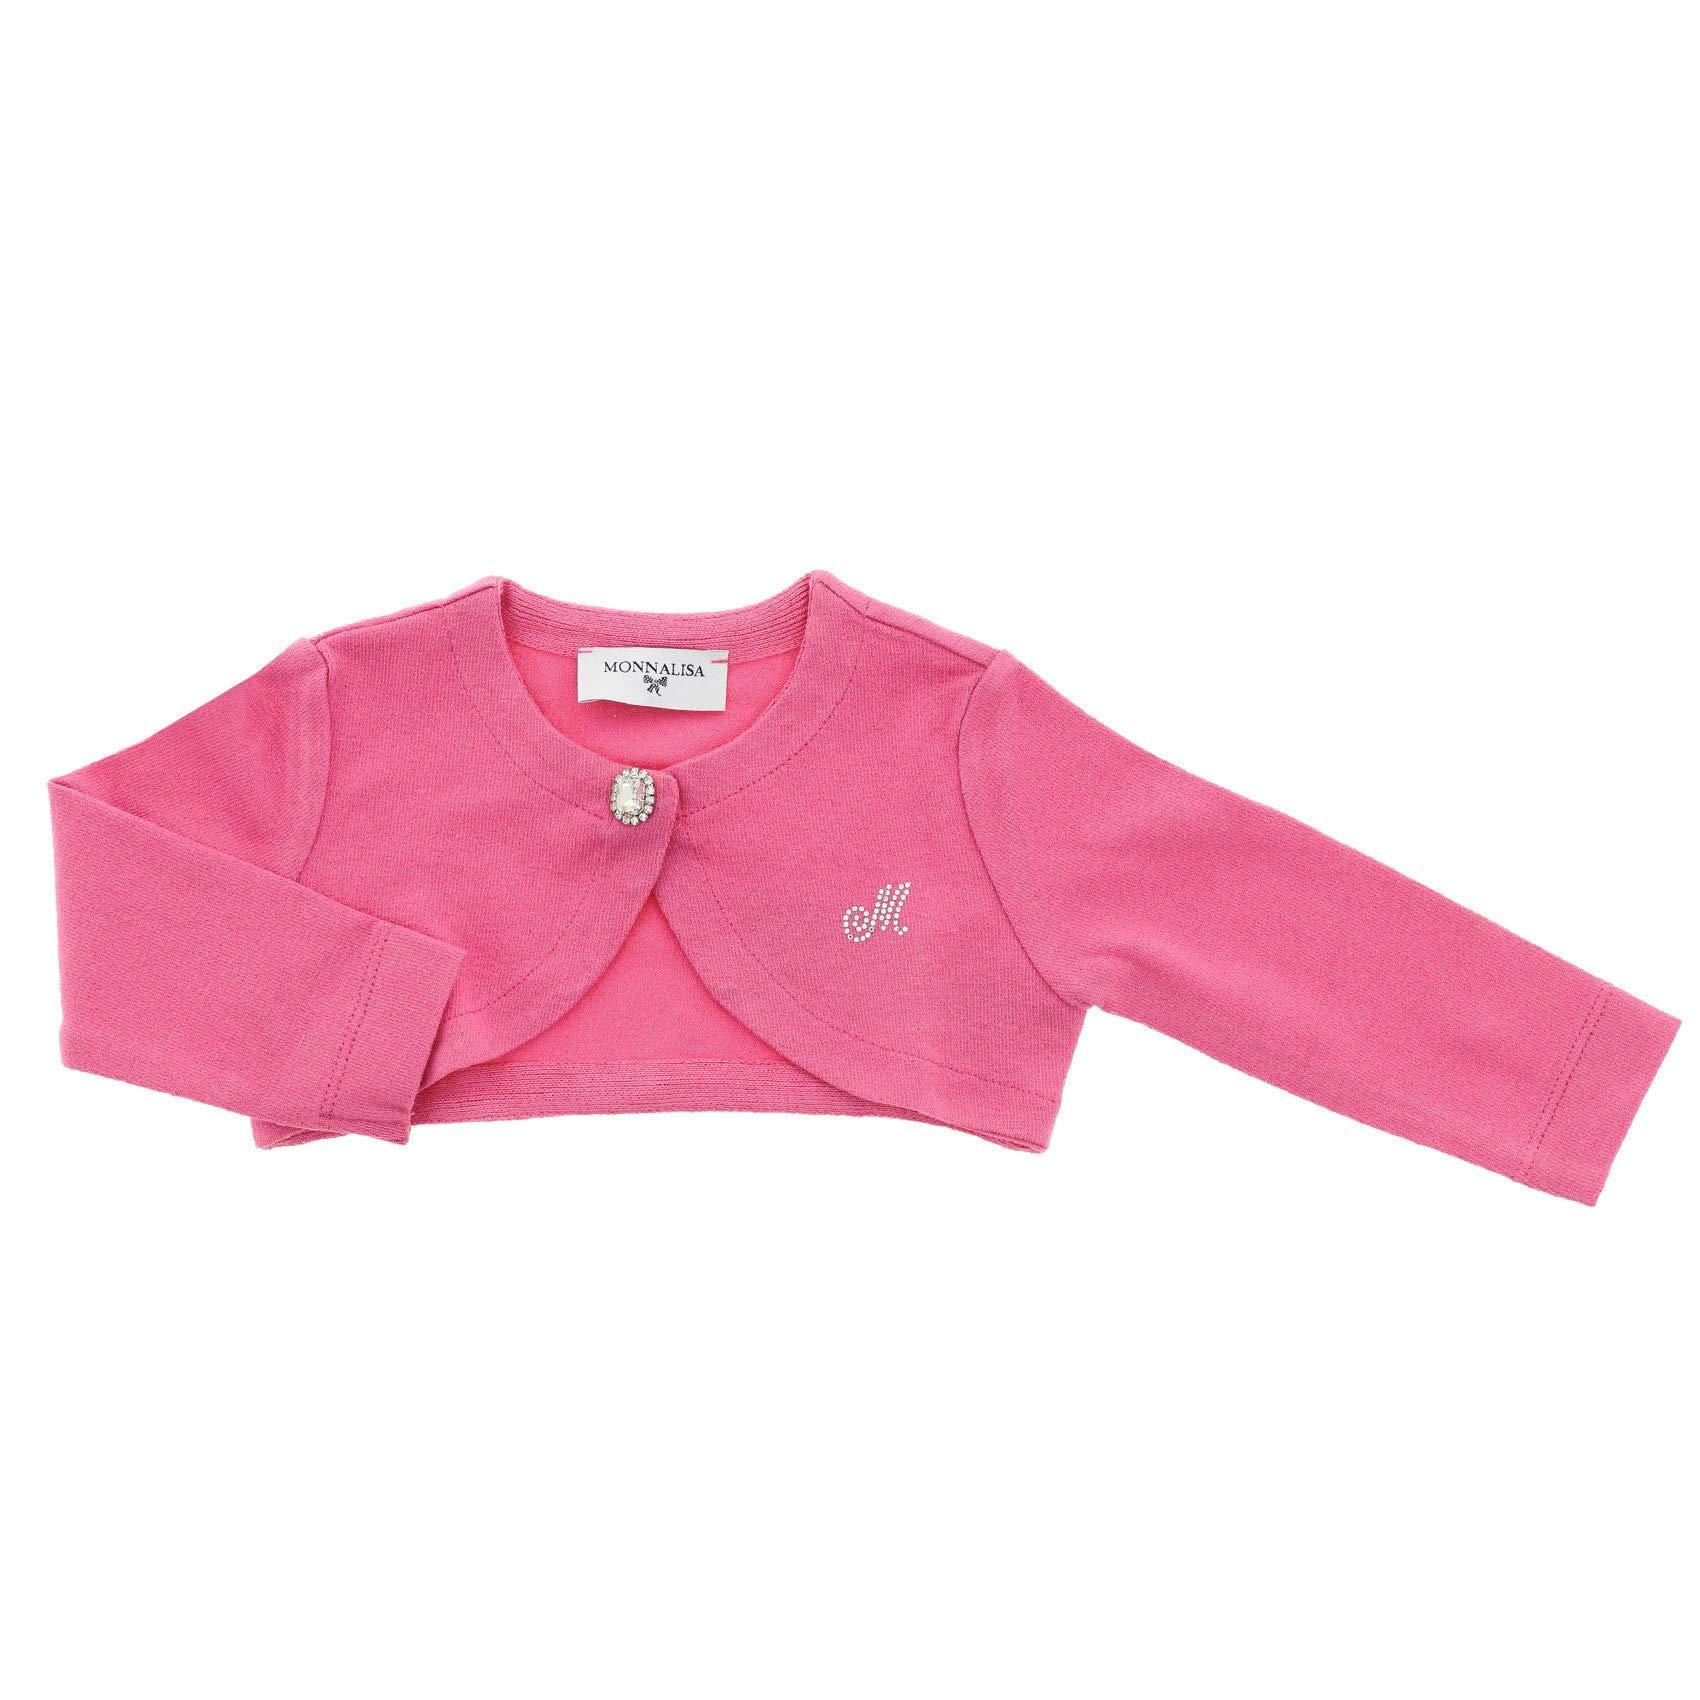 Monnalisa Baby Girls 37Cbolcrepe0095 Pink Viscose Cardigan by Monnalisa